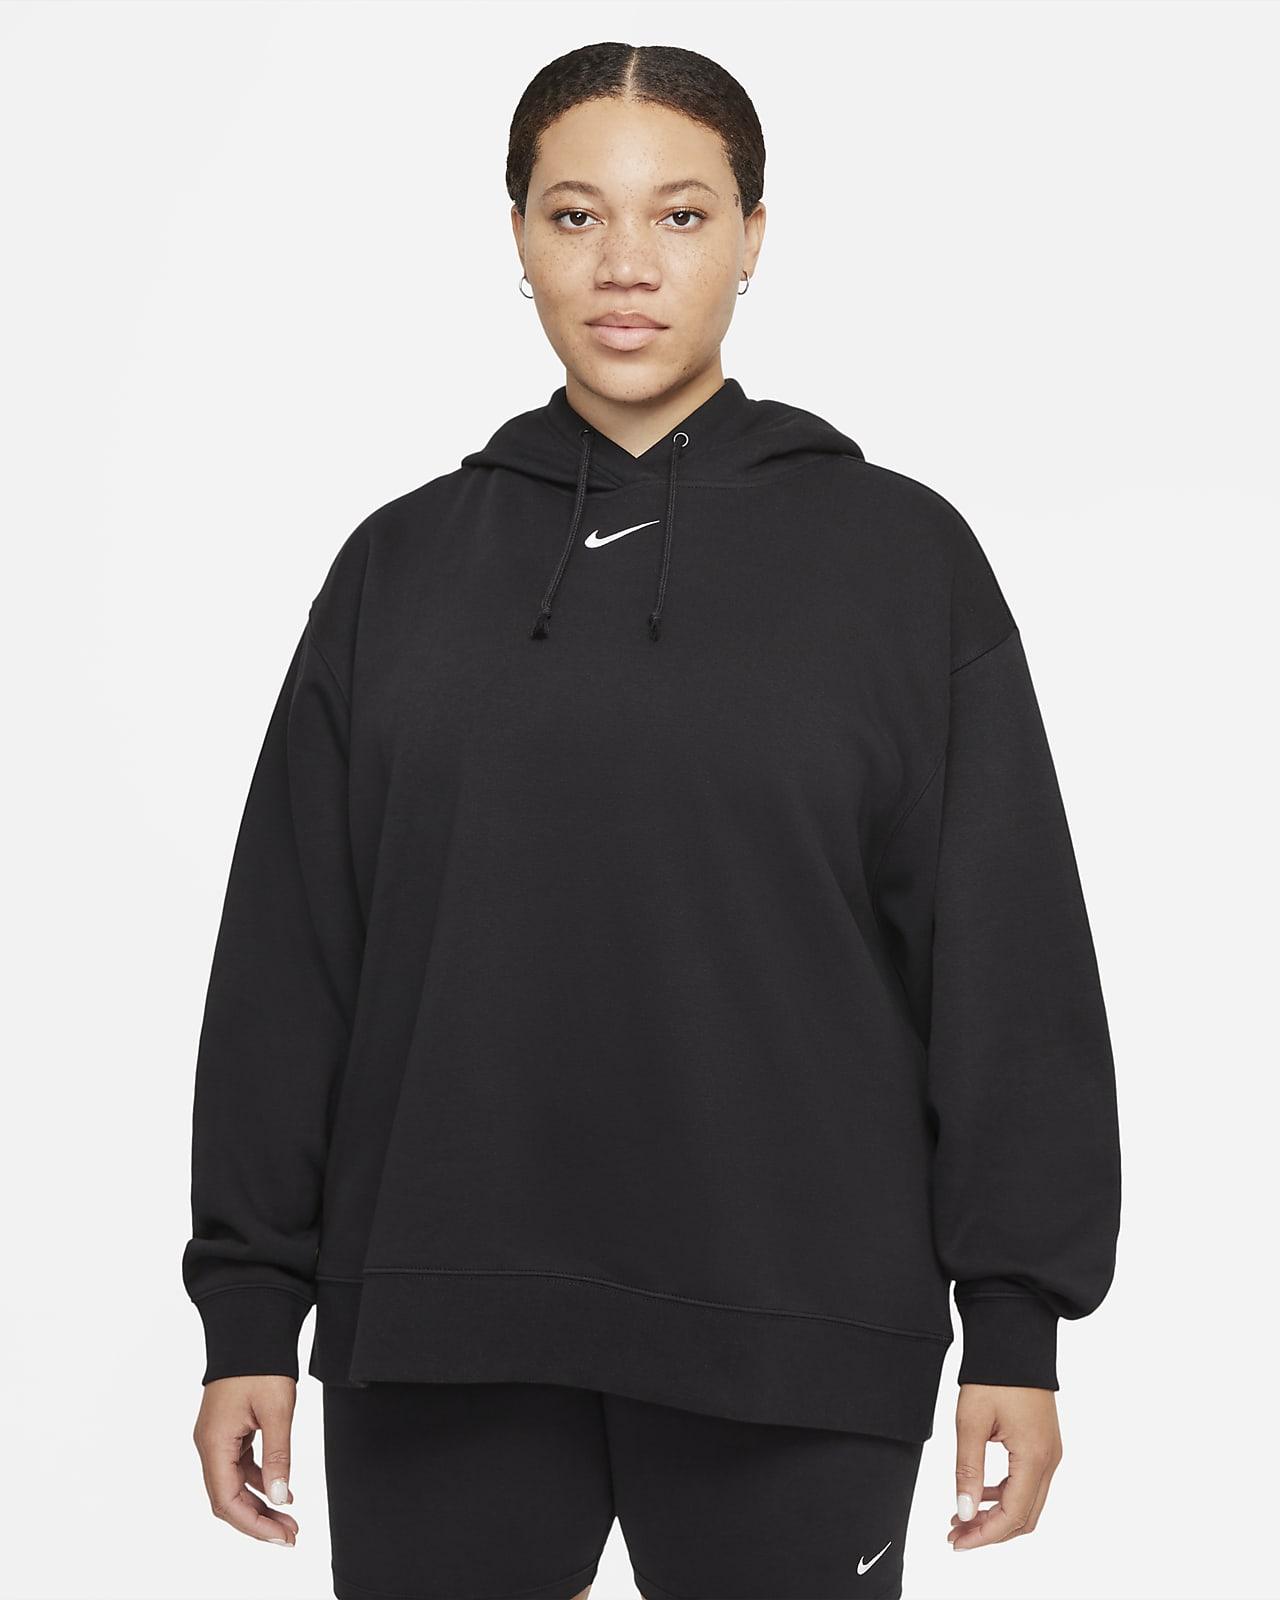 Sudadera con gorro de tejido Fleece oversized para mujer Nike Sportswear Collection Essentials (talla grande)